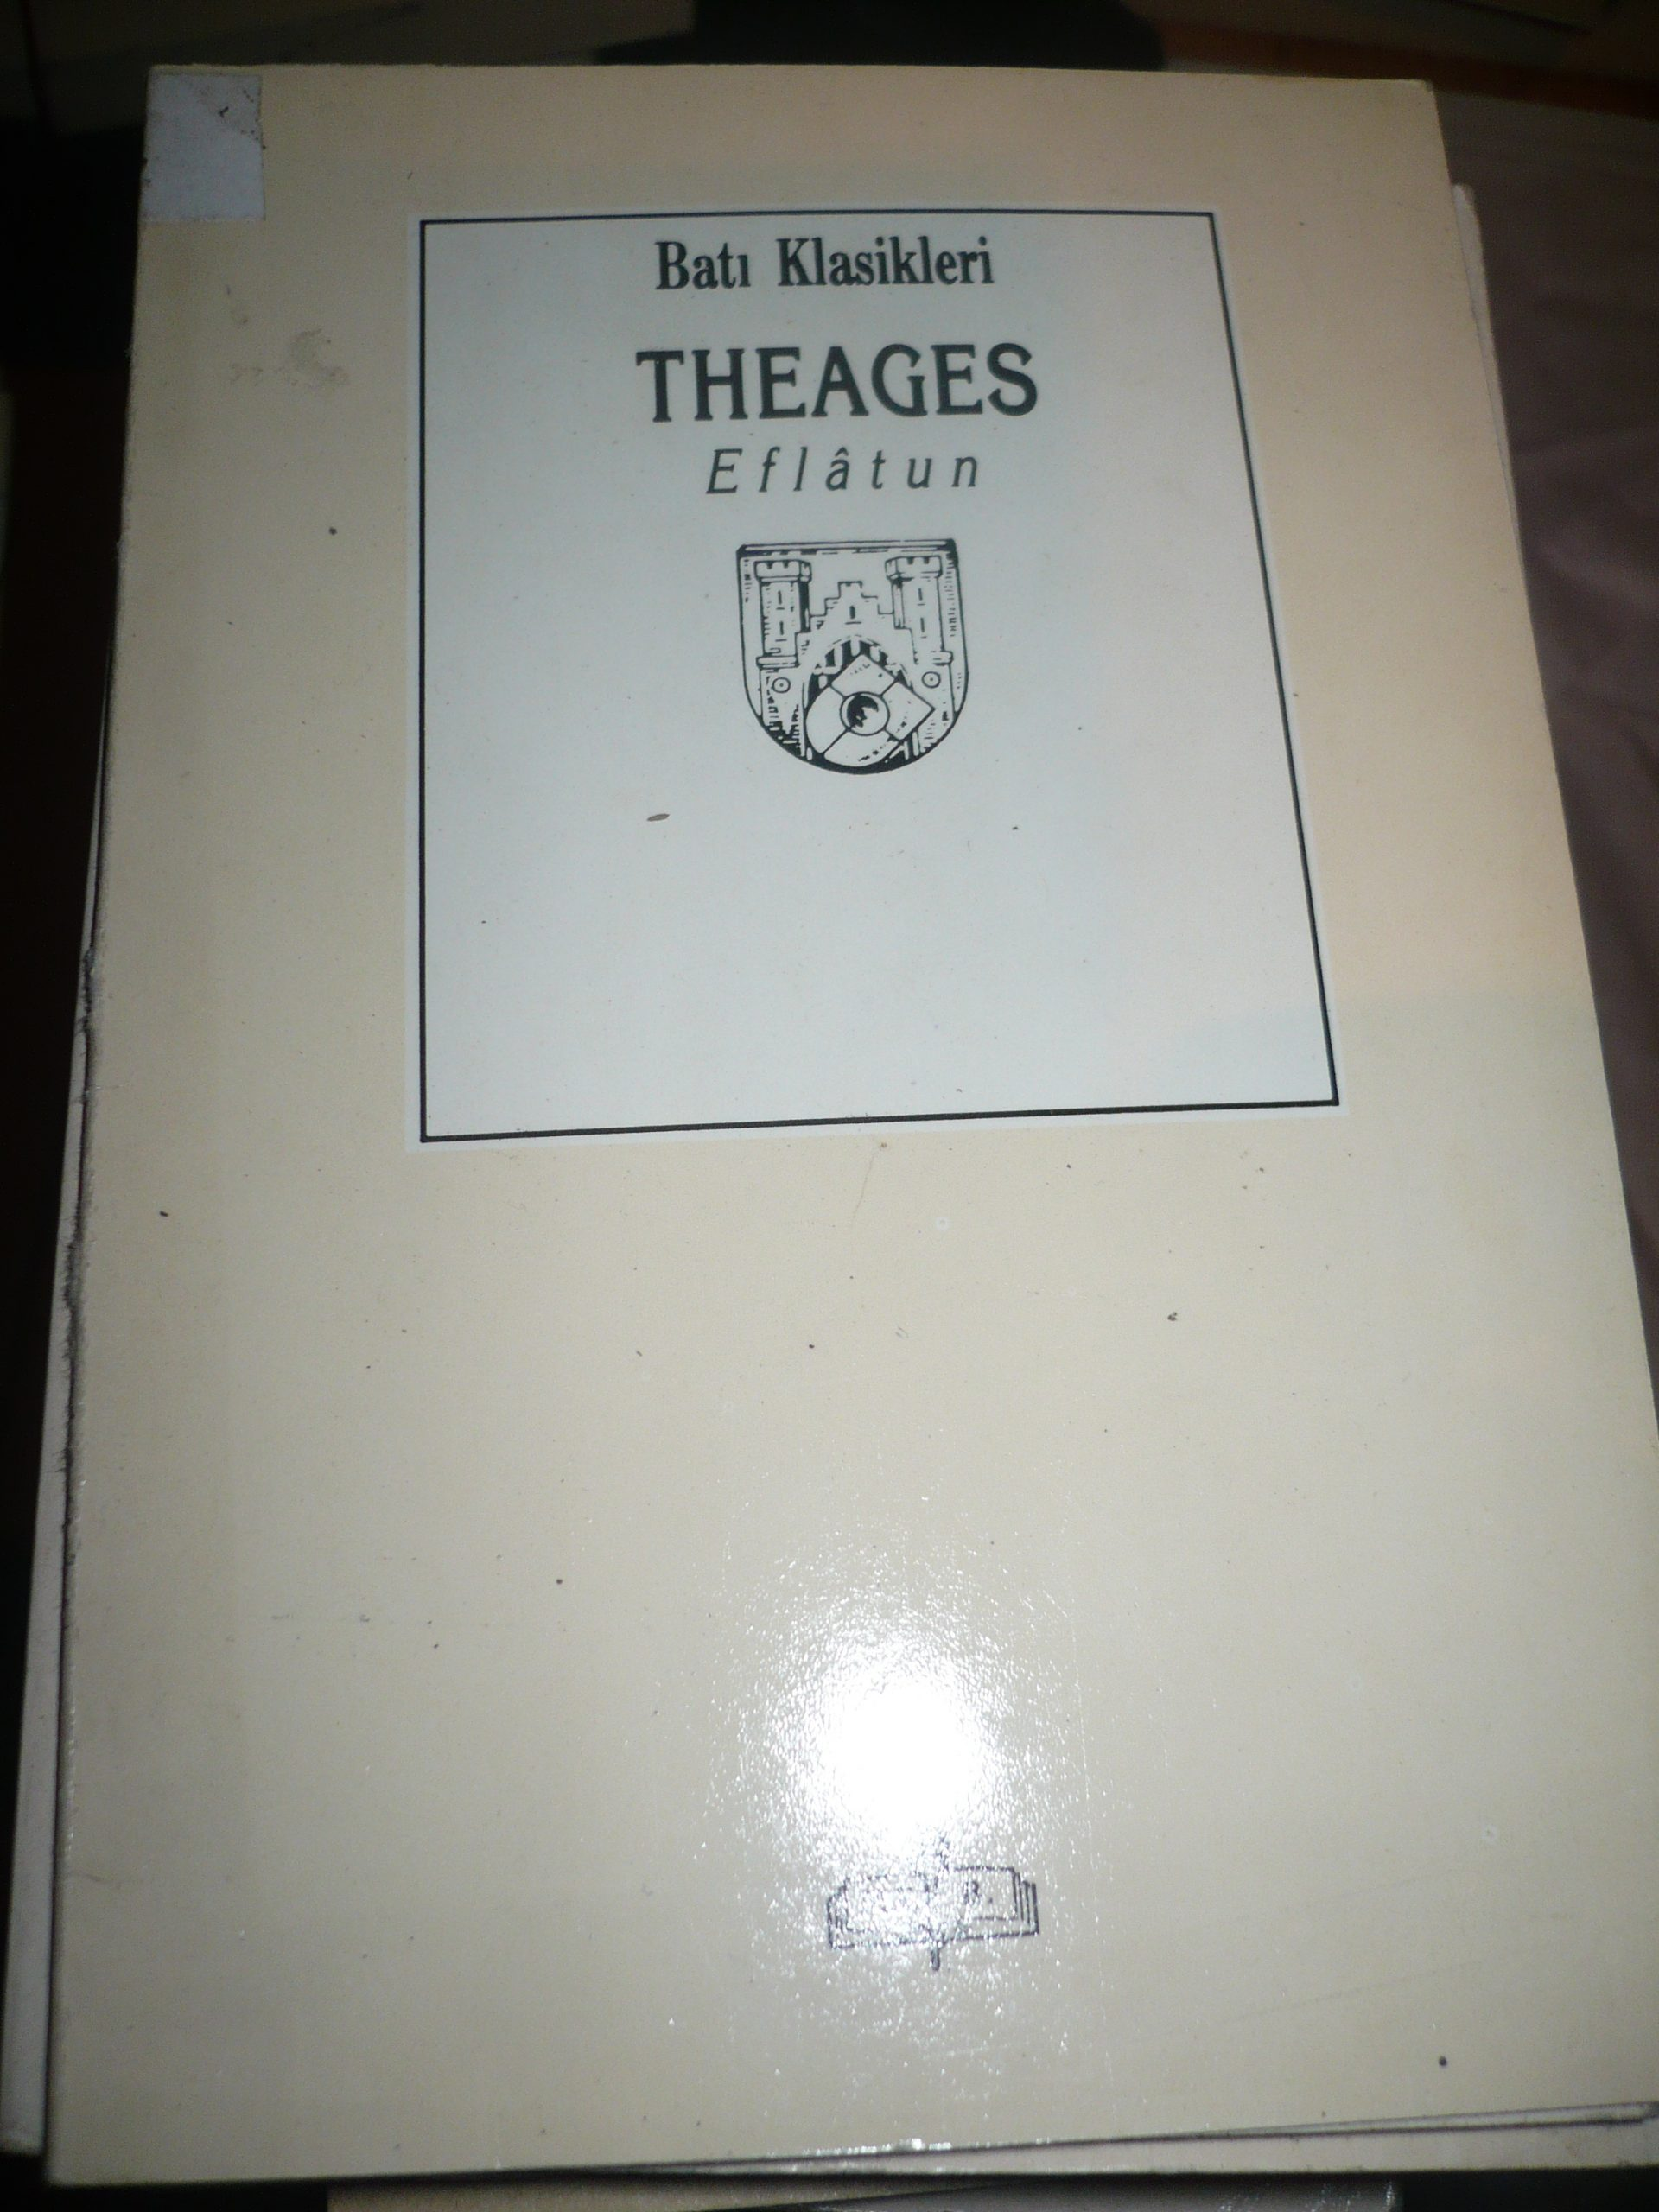 THEAGES/Eflatun/10 tl